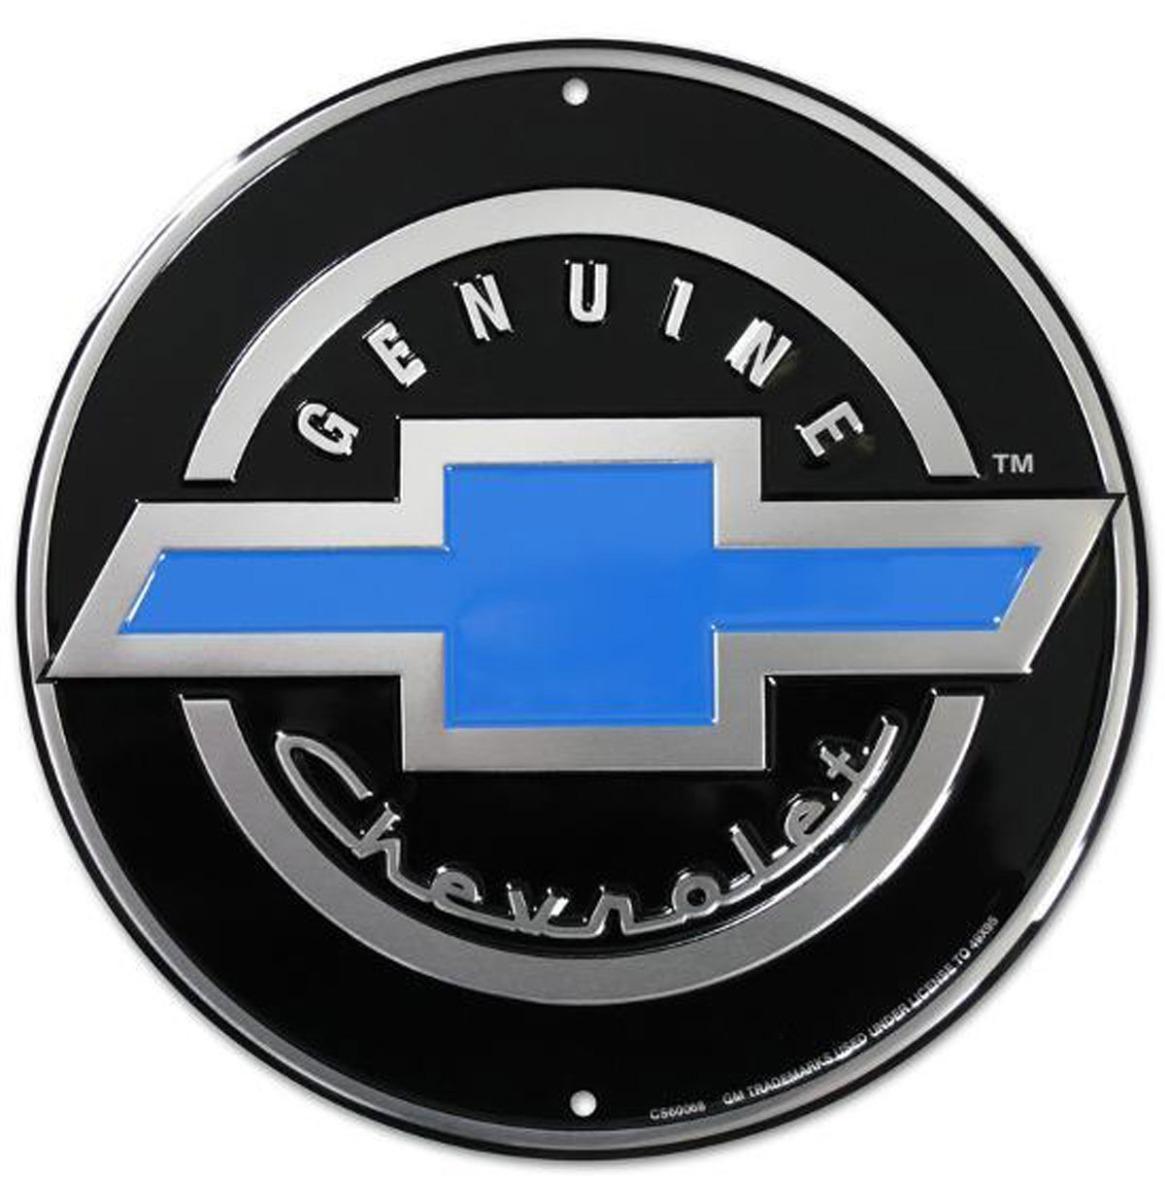 Genuine Chevy Chevrolet Metalen Bord 60 cm